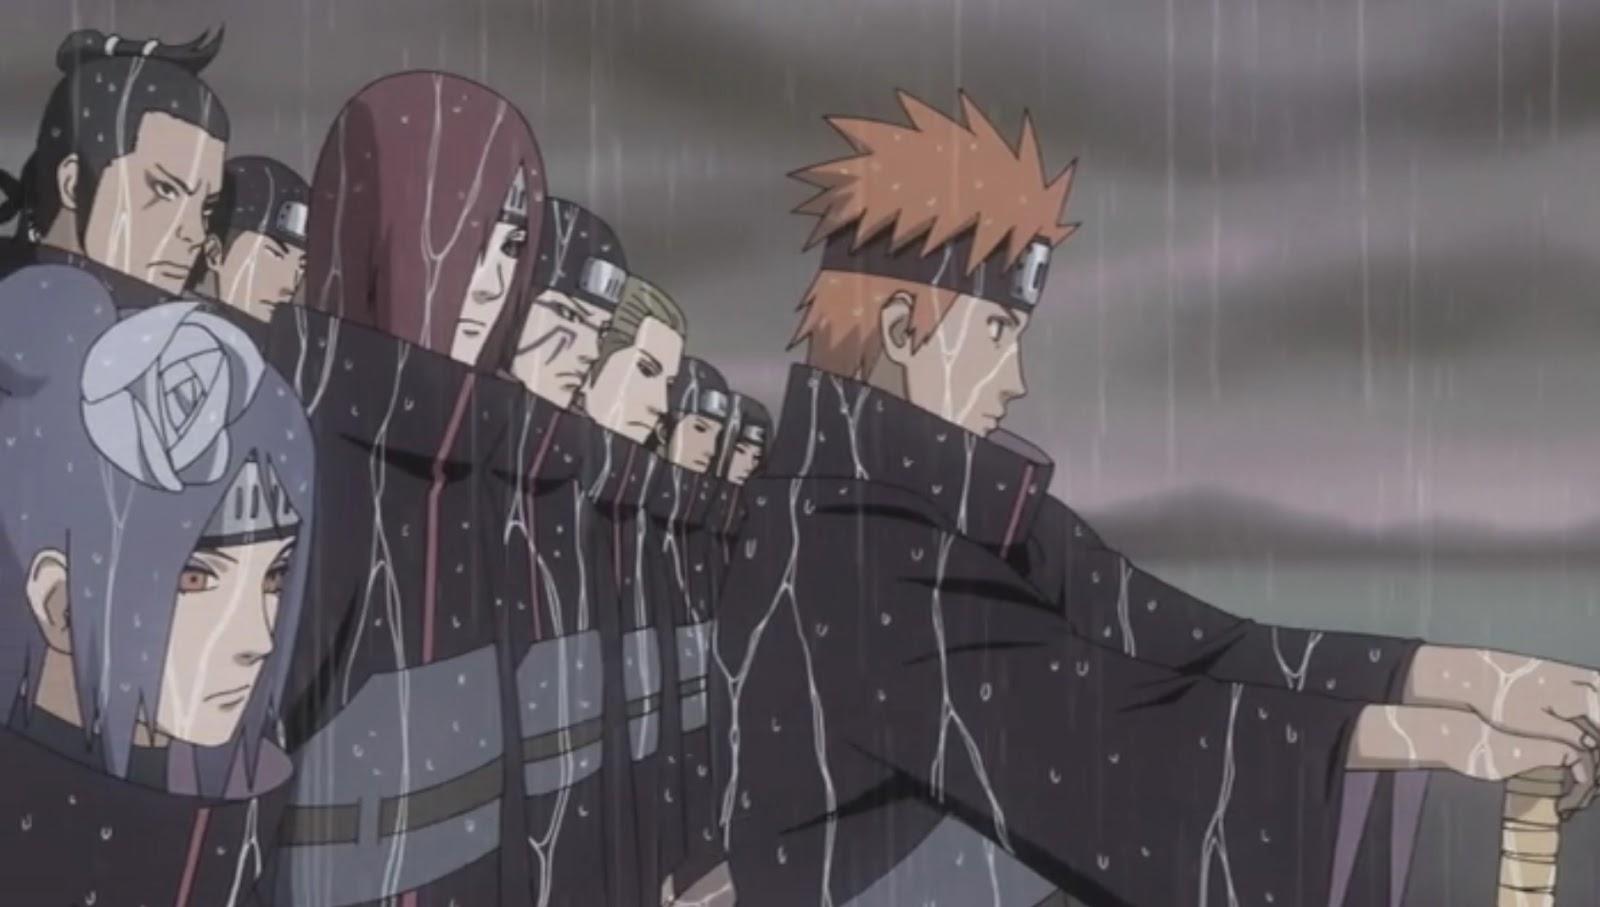 Naruto Shippuden: Episódio 173 – A Origem de Pain